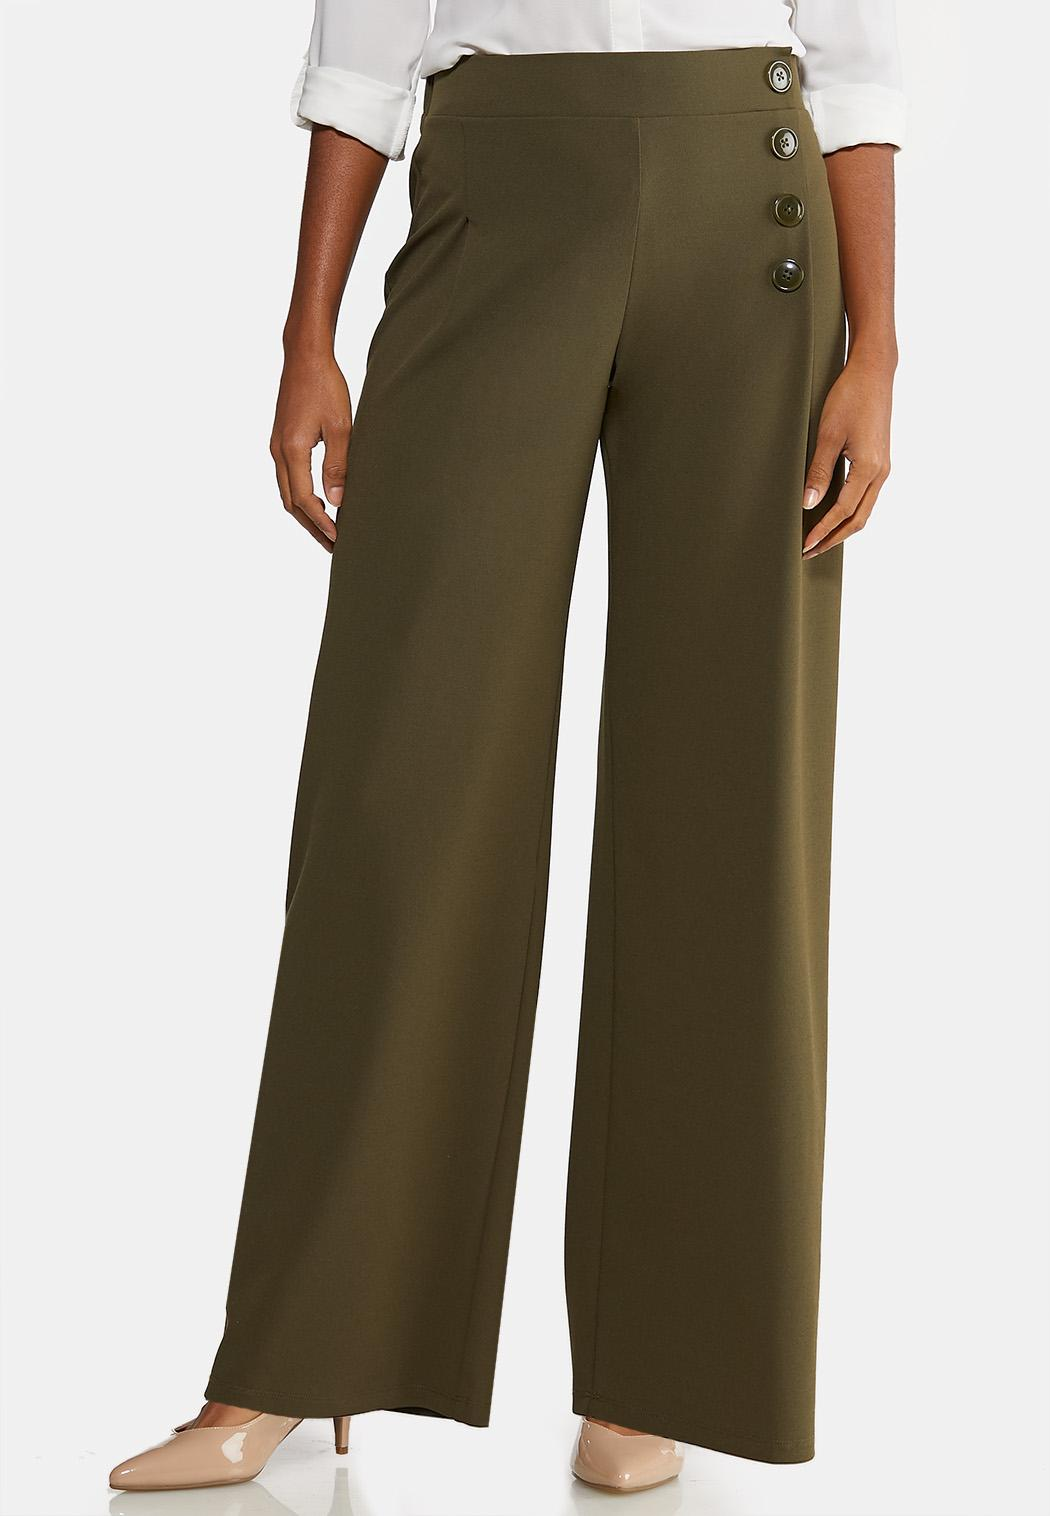 Wide Leg Button Pants